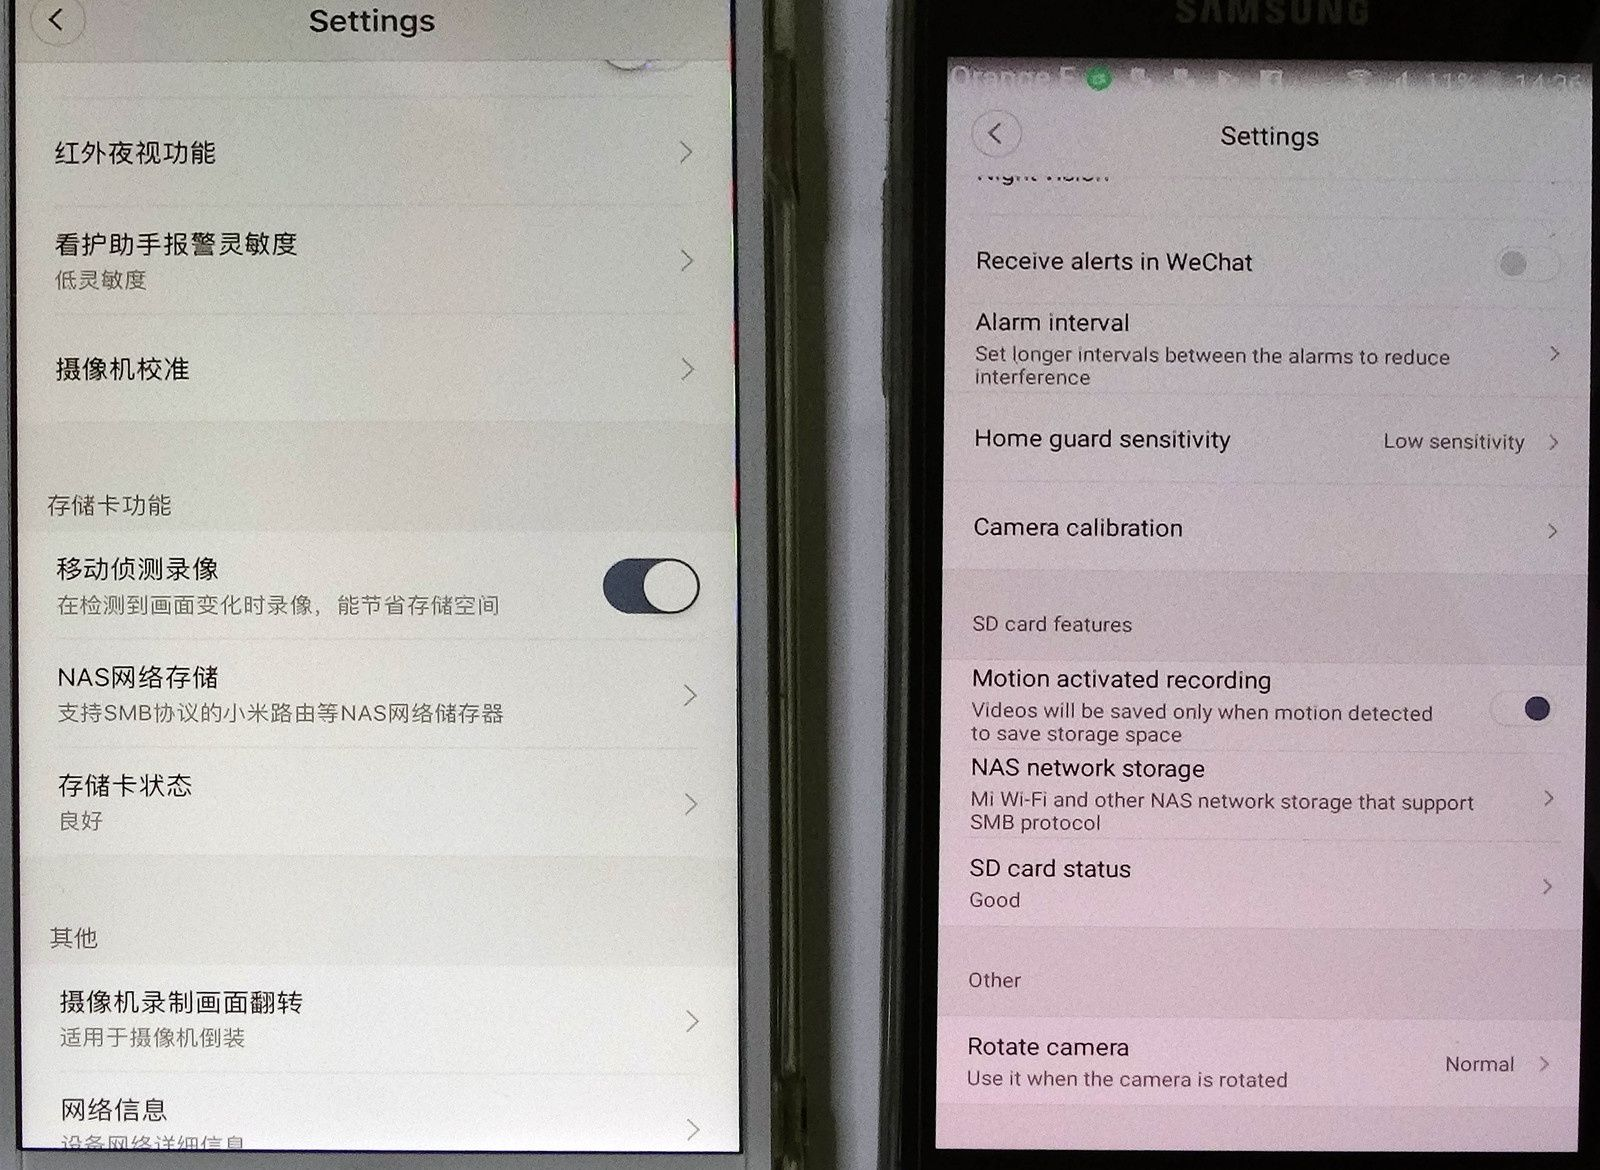 Comparaison de l'appli sur IOS (80% chinois : NULLLL) et Android (99% anglais)